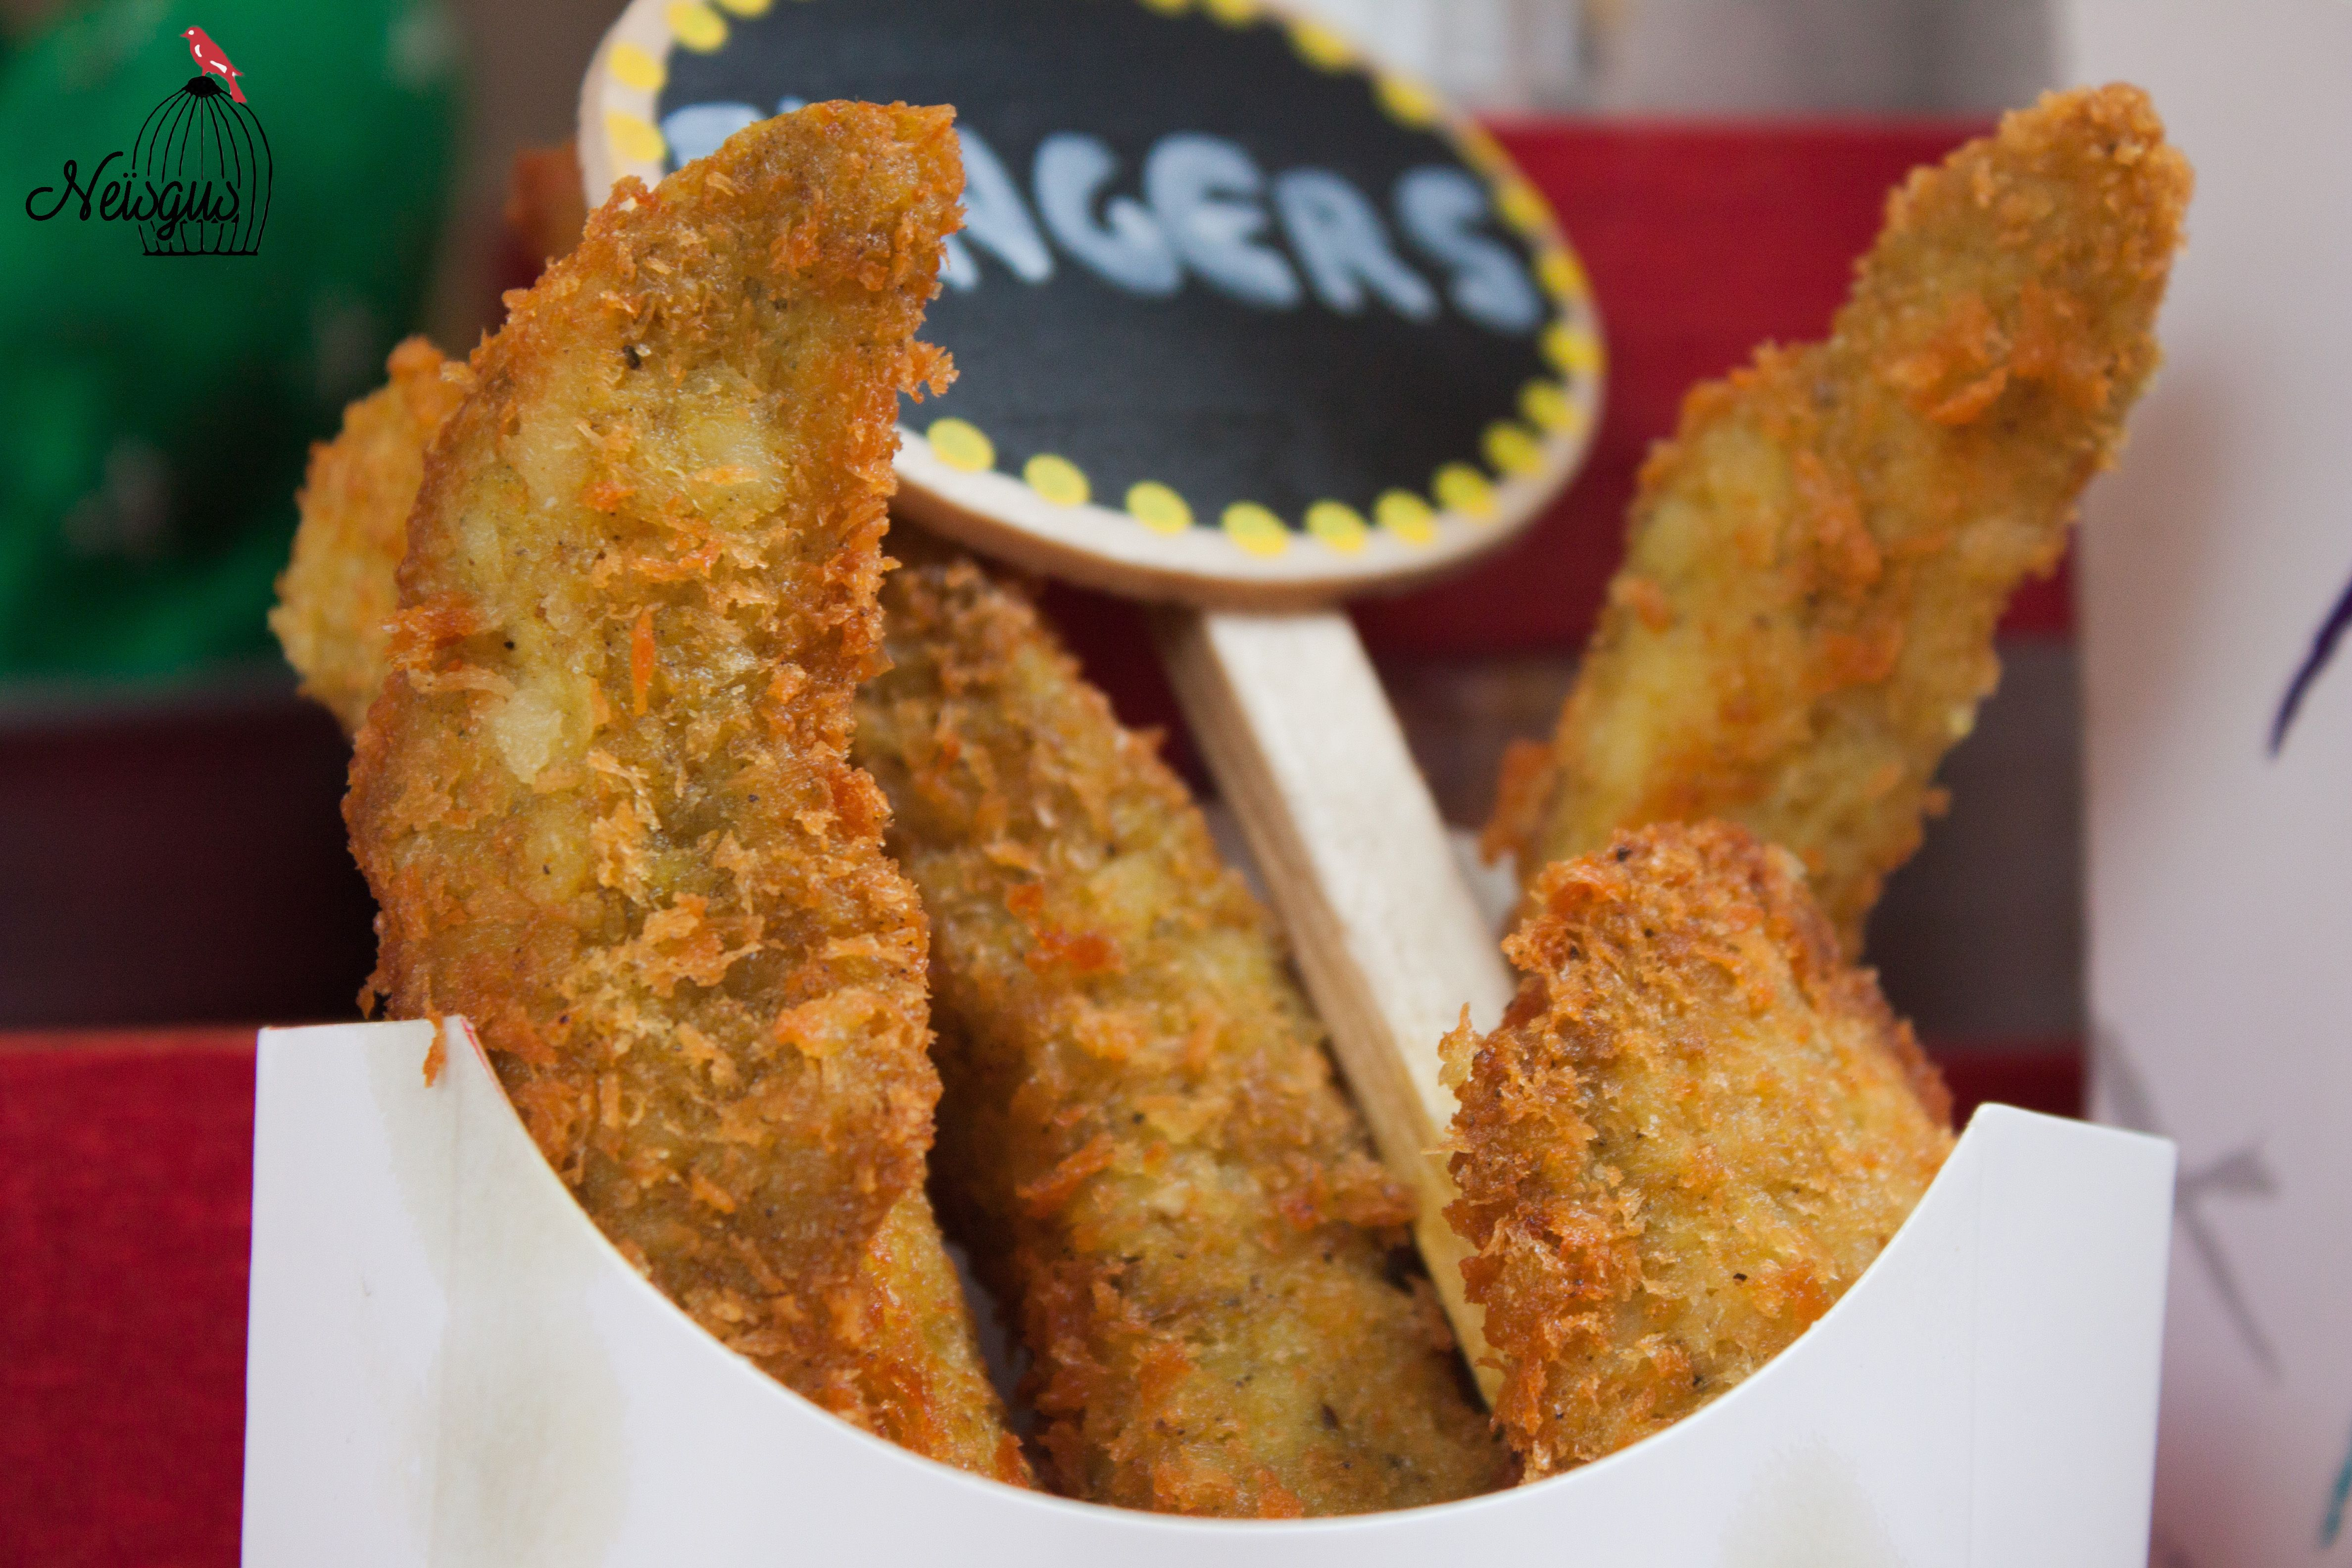 Fingers del Street Food en Gerona #fingers #chips #potatoes #patatas #deluxe #patatasdeluxe #hungry #eat #timetoeat #foodporn #girona #streetfood #food #street